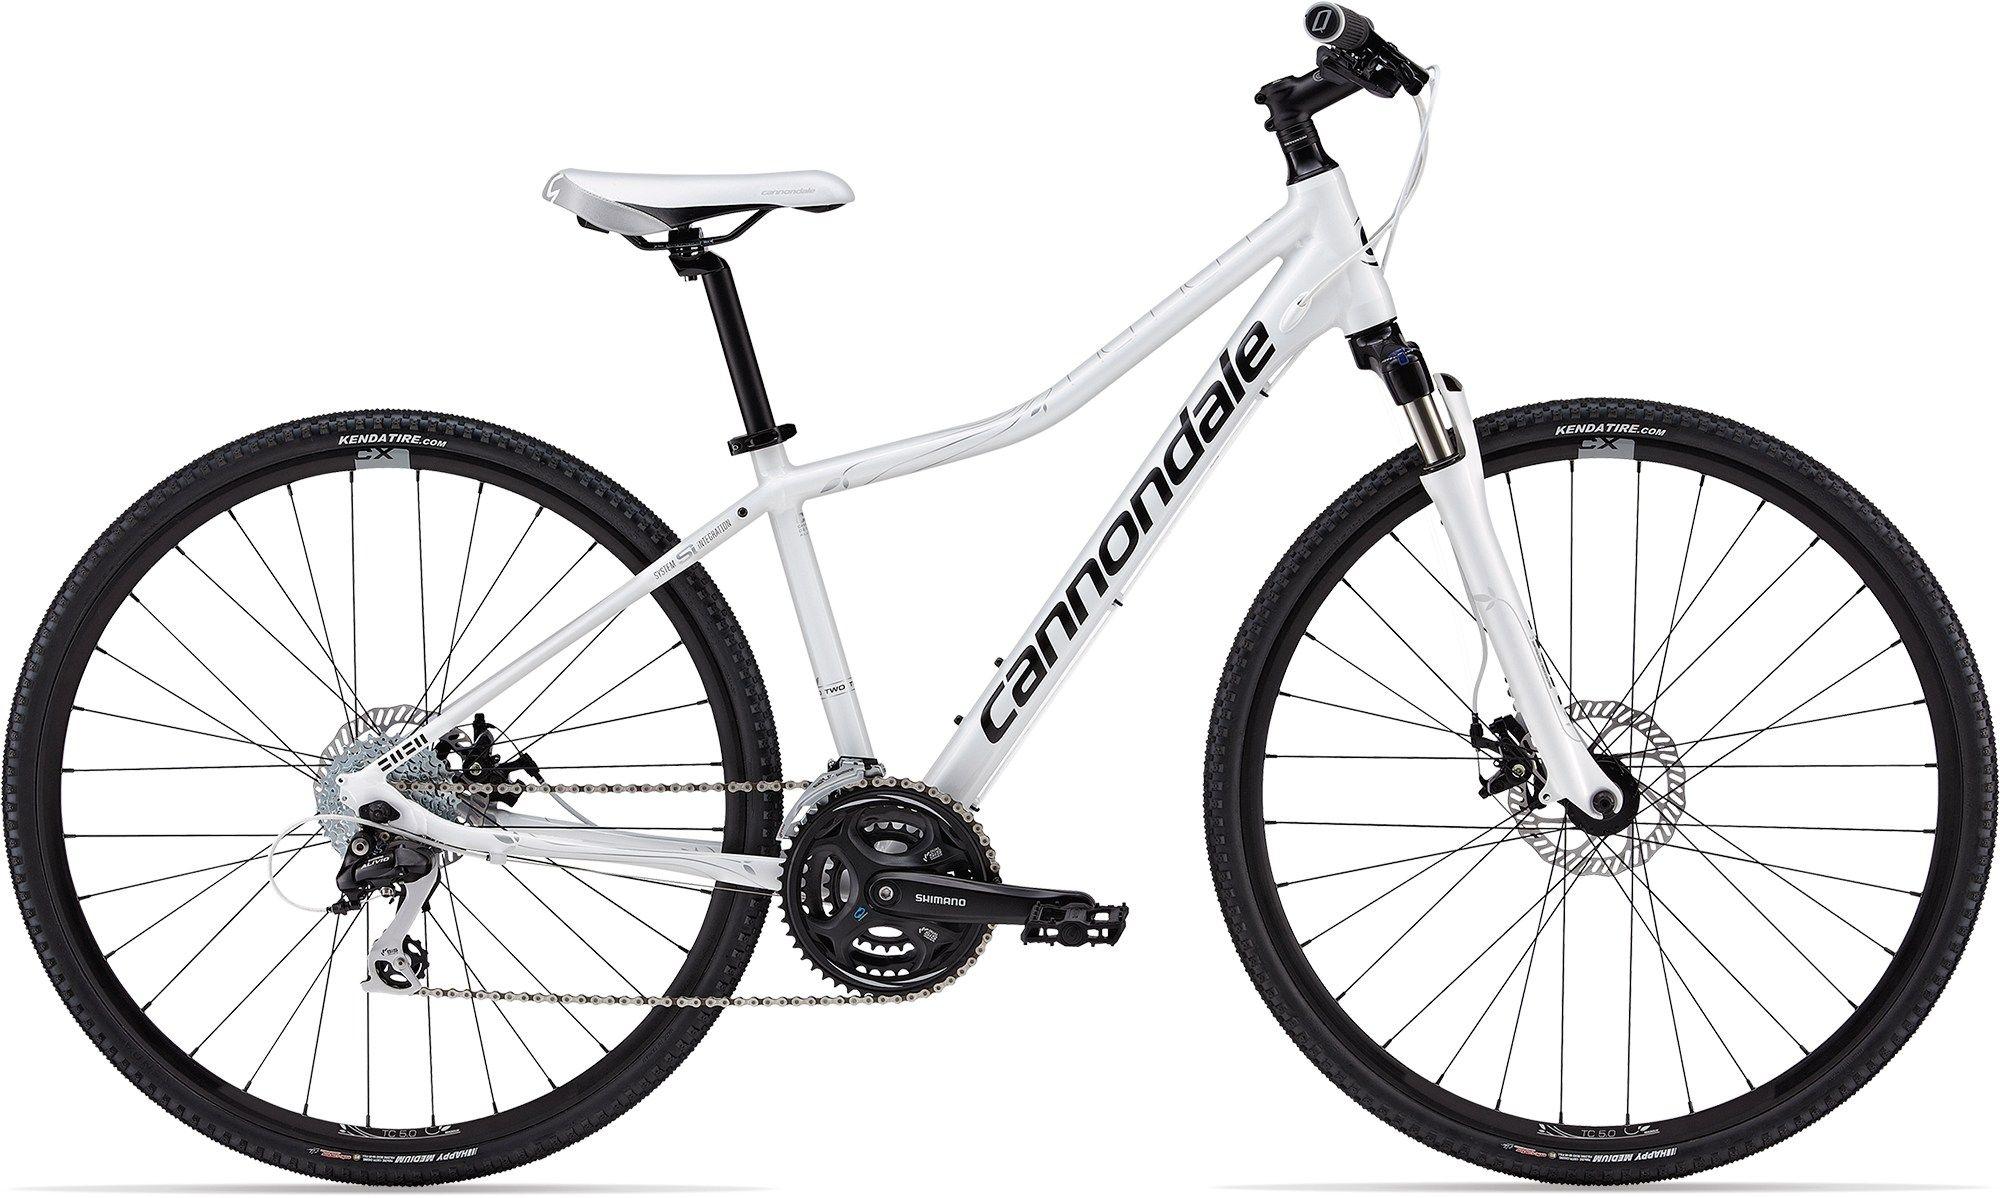 Cannondale Althea 2 Women S Bike 2013 769 00 Cannondale Womens Bike Hybrid Bike